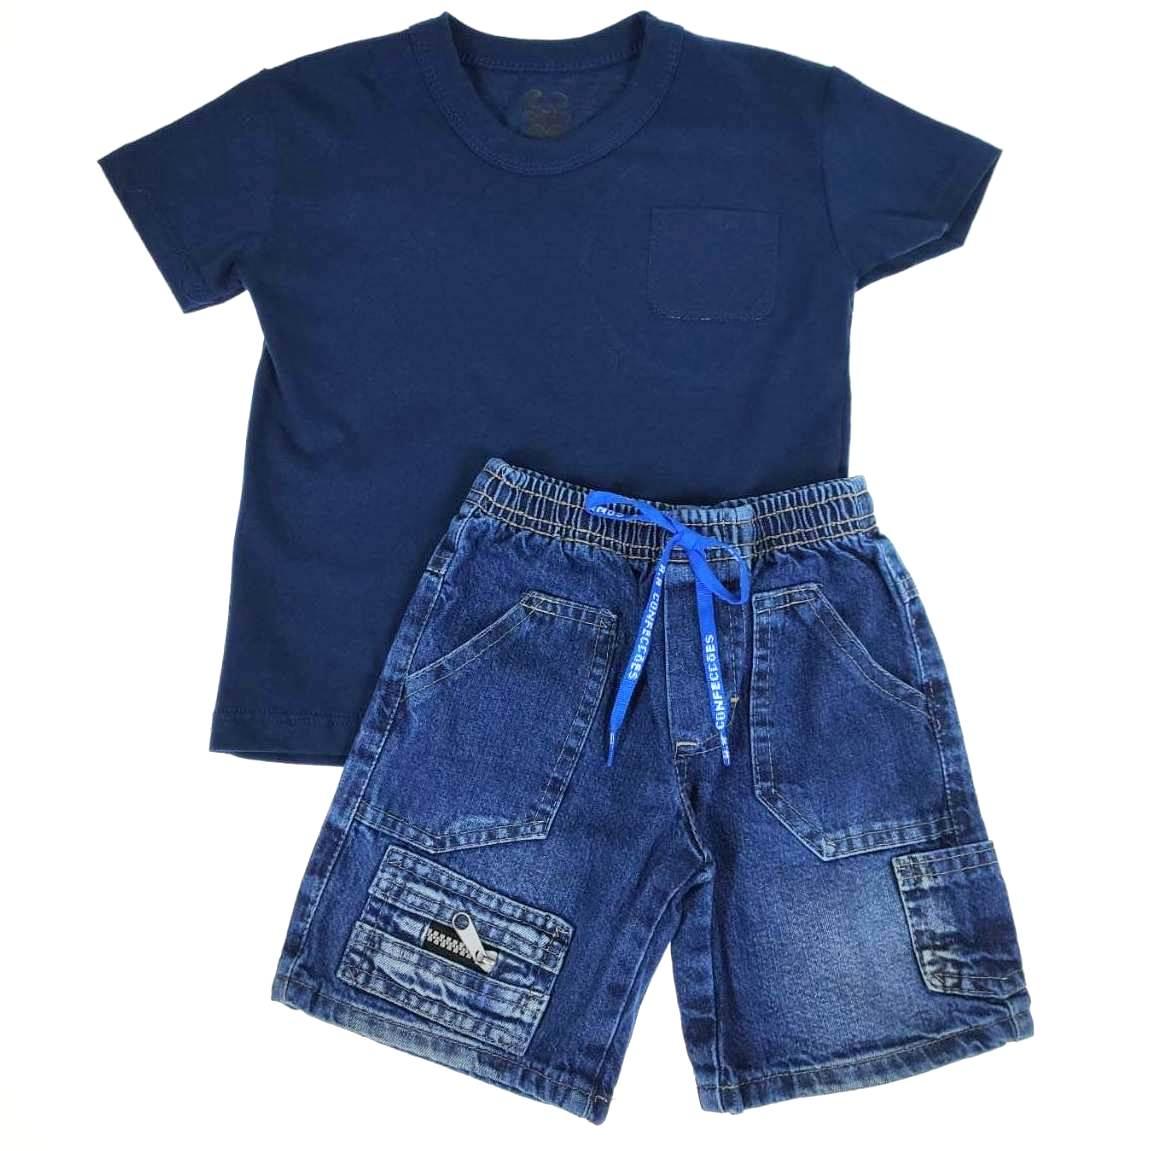 Conjunto Curto Camiseta Azul Bolso e Shorts Jeans